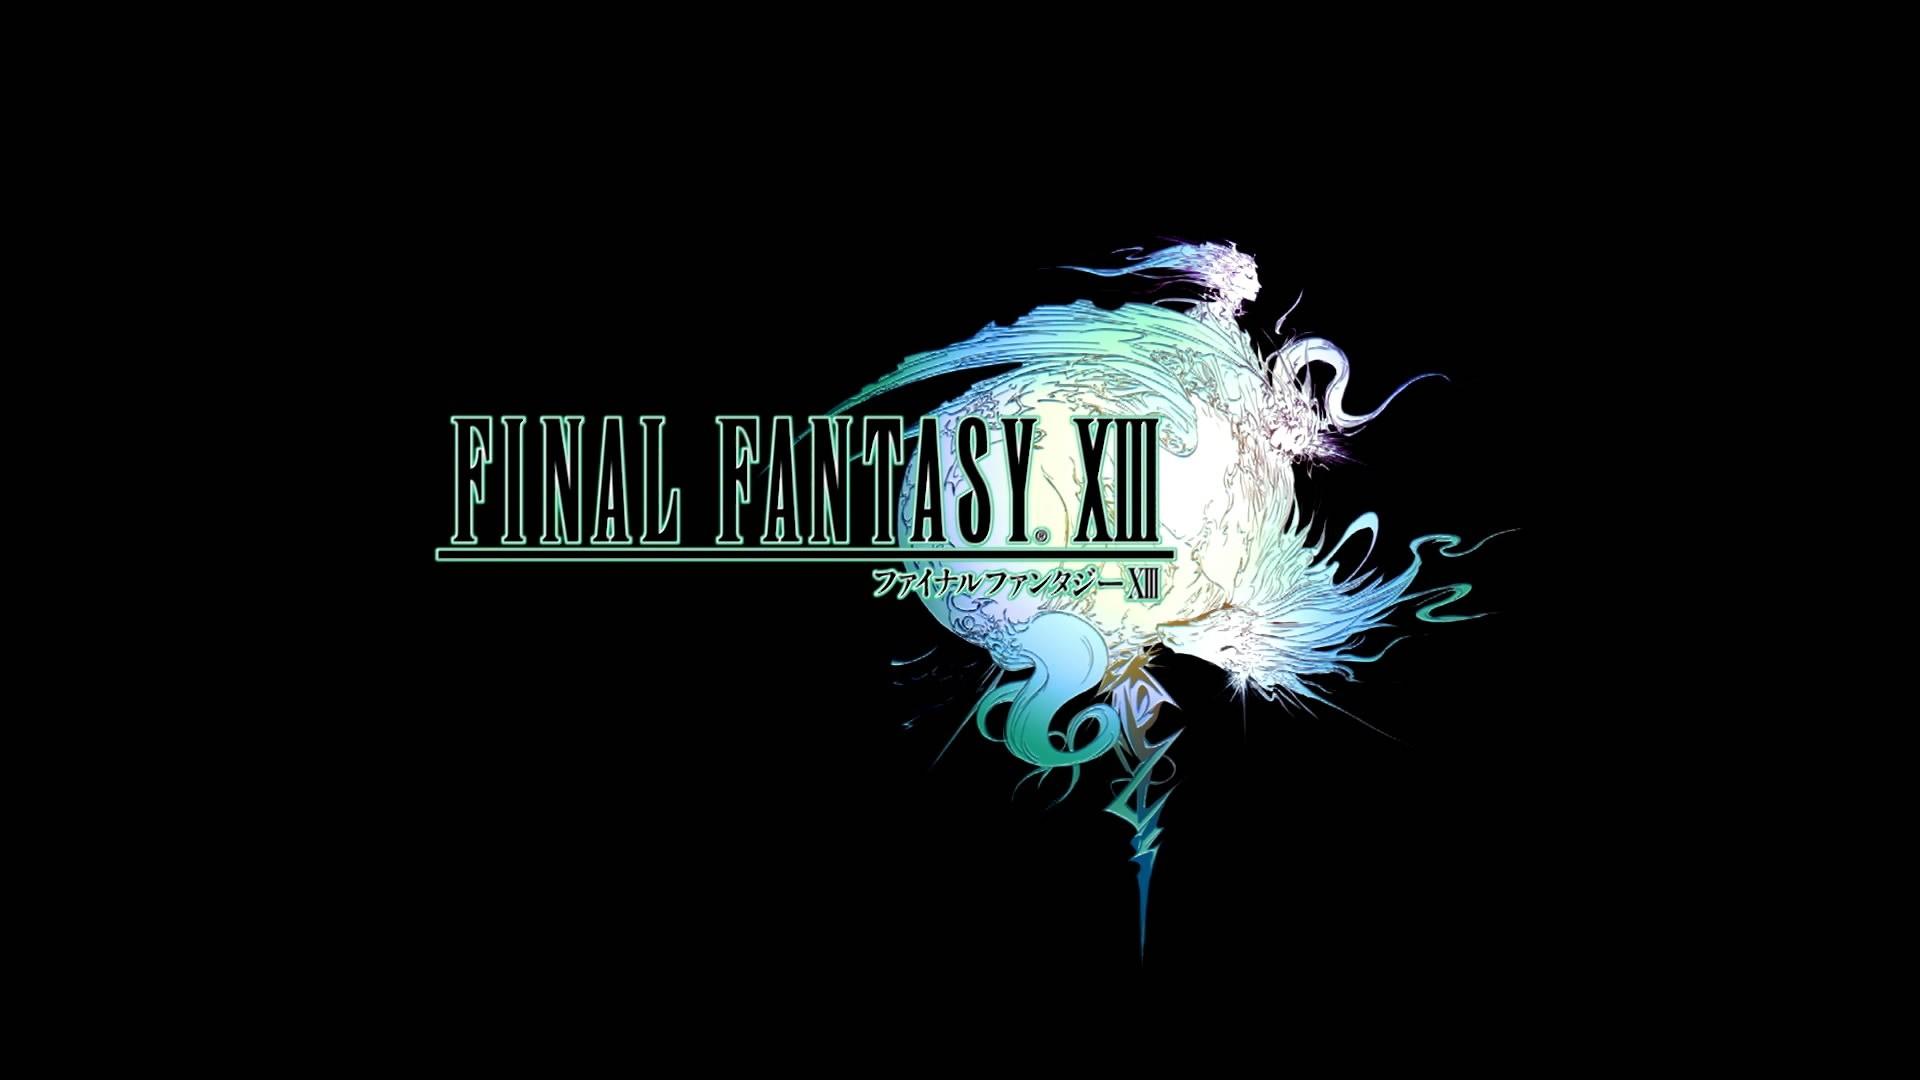 Final fantasy xiii wallpaper 70 images - Final fantasy 10 wallpaper 1920x1080 ...